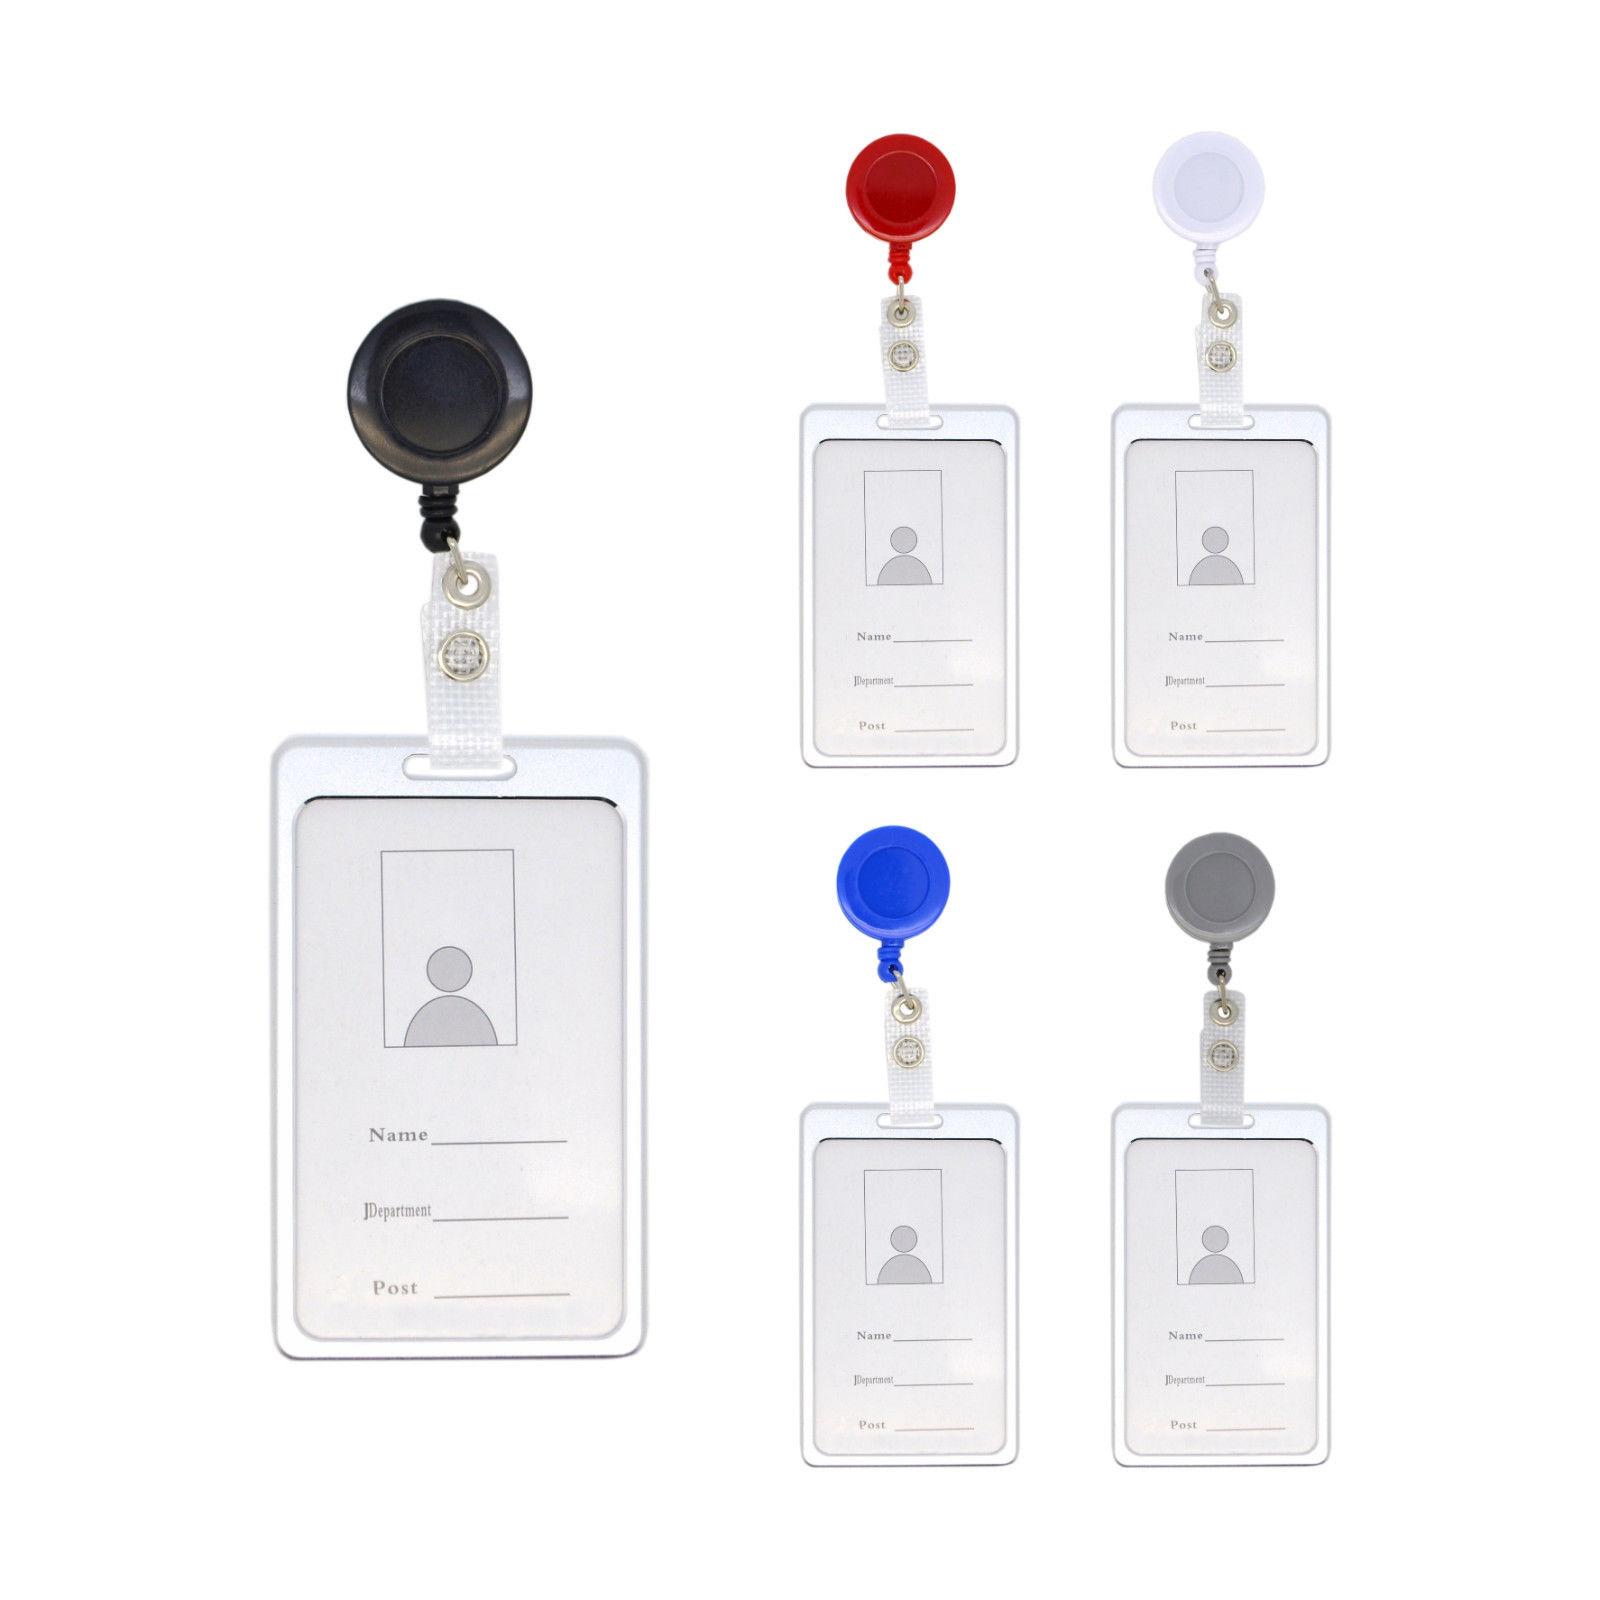 Folie Magnetfolie roh unbeschichtet 310mm x 1000mm x 1,5mm Magnetband